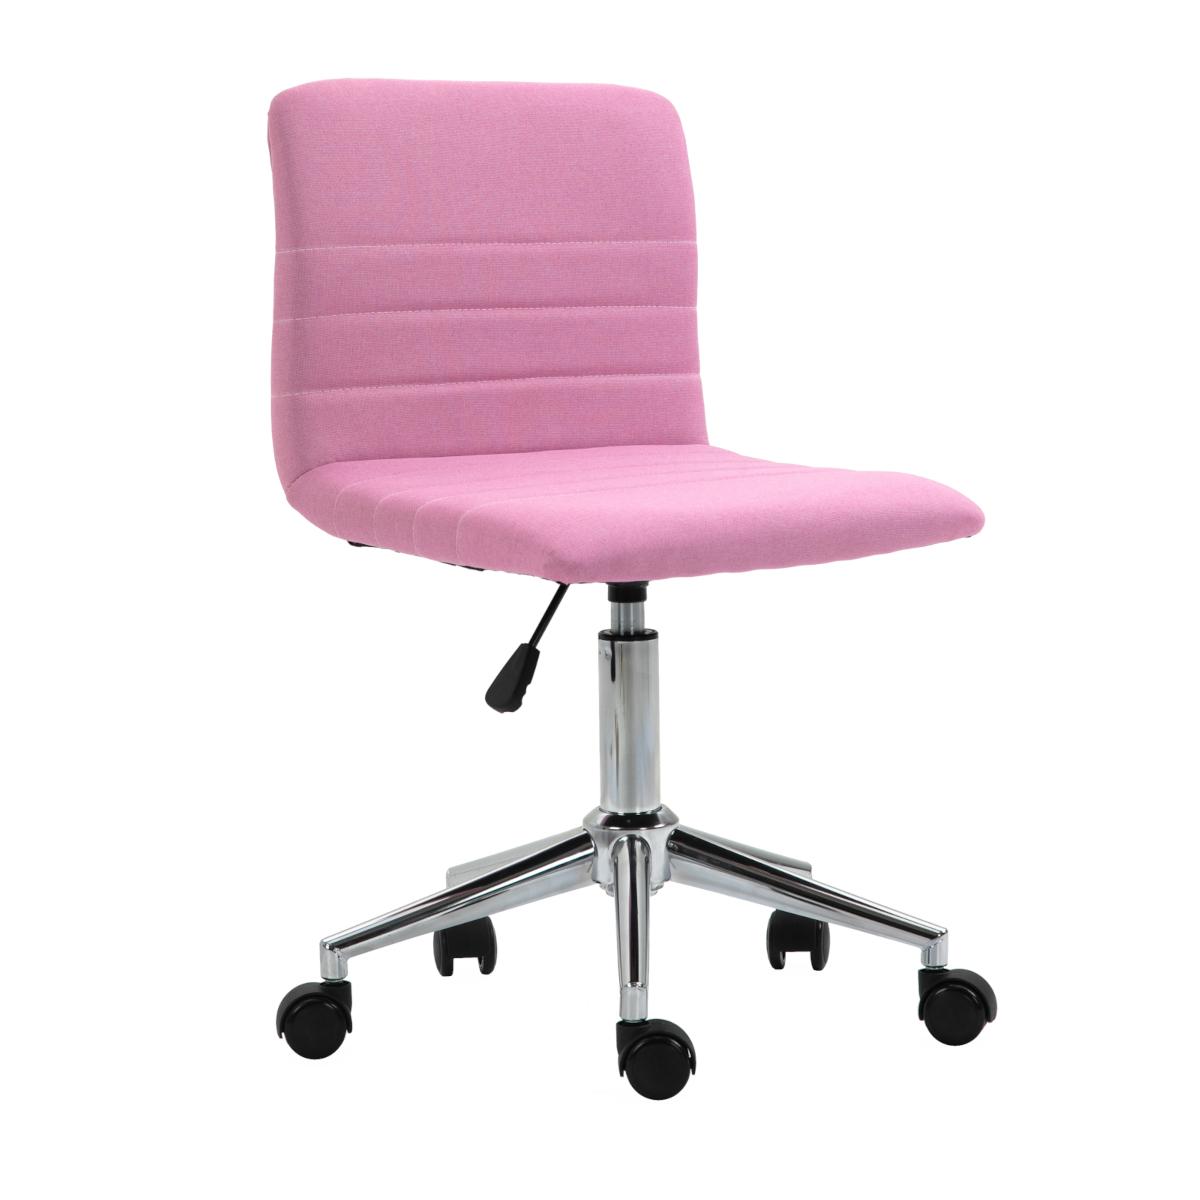 92216 SVITA LINUS Schreibtischstuhl Kinder Drehstuhl Stoffbezug Pink